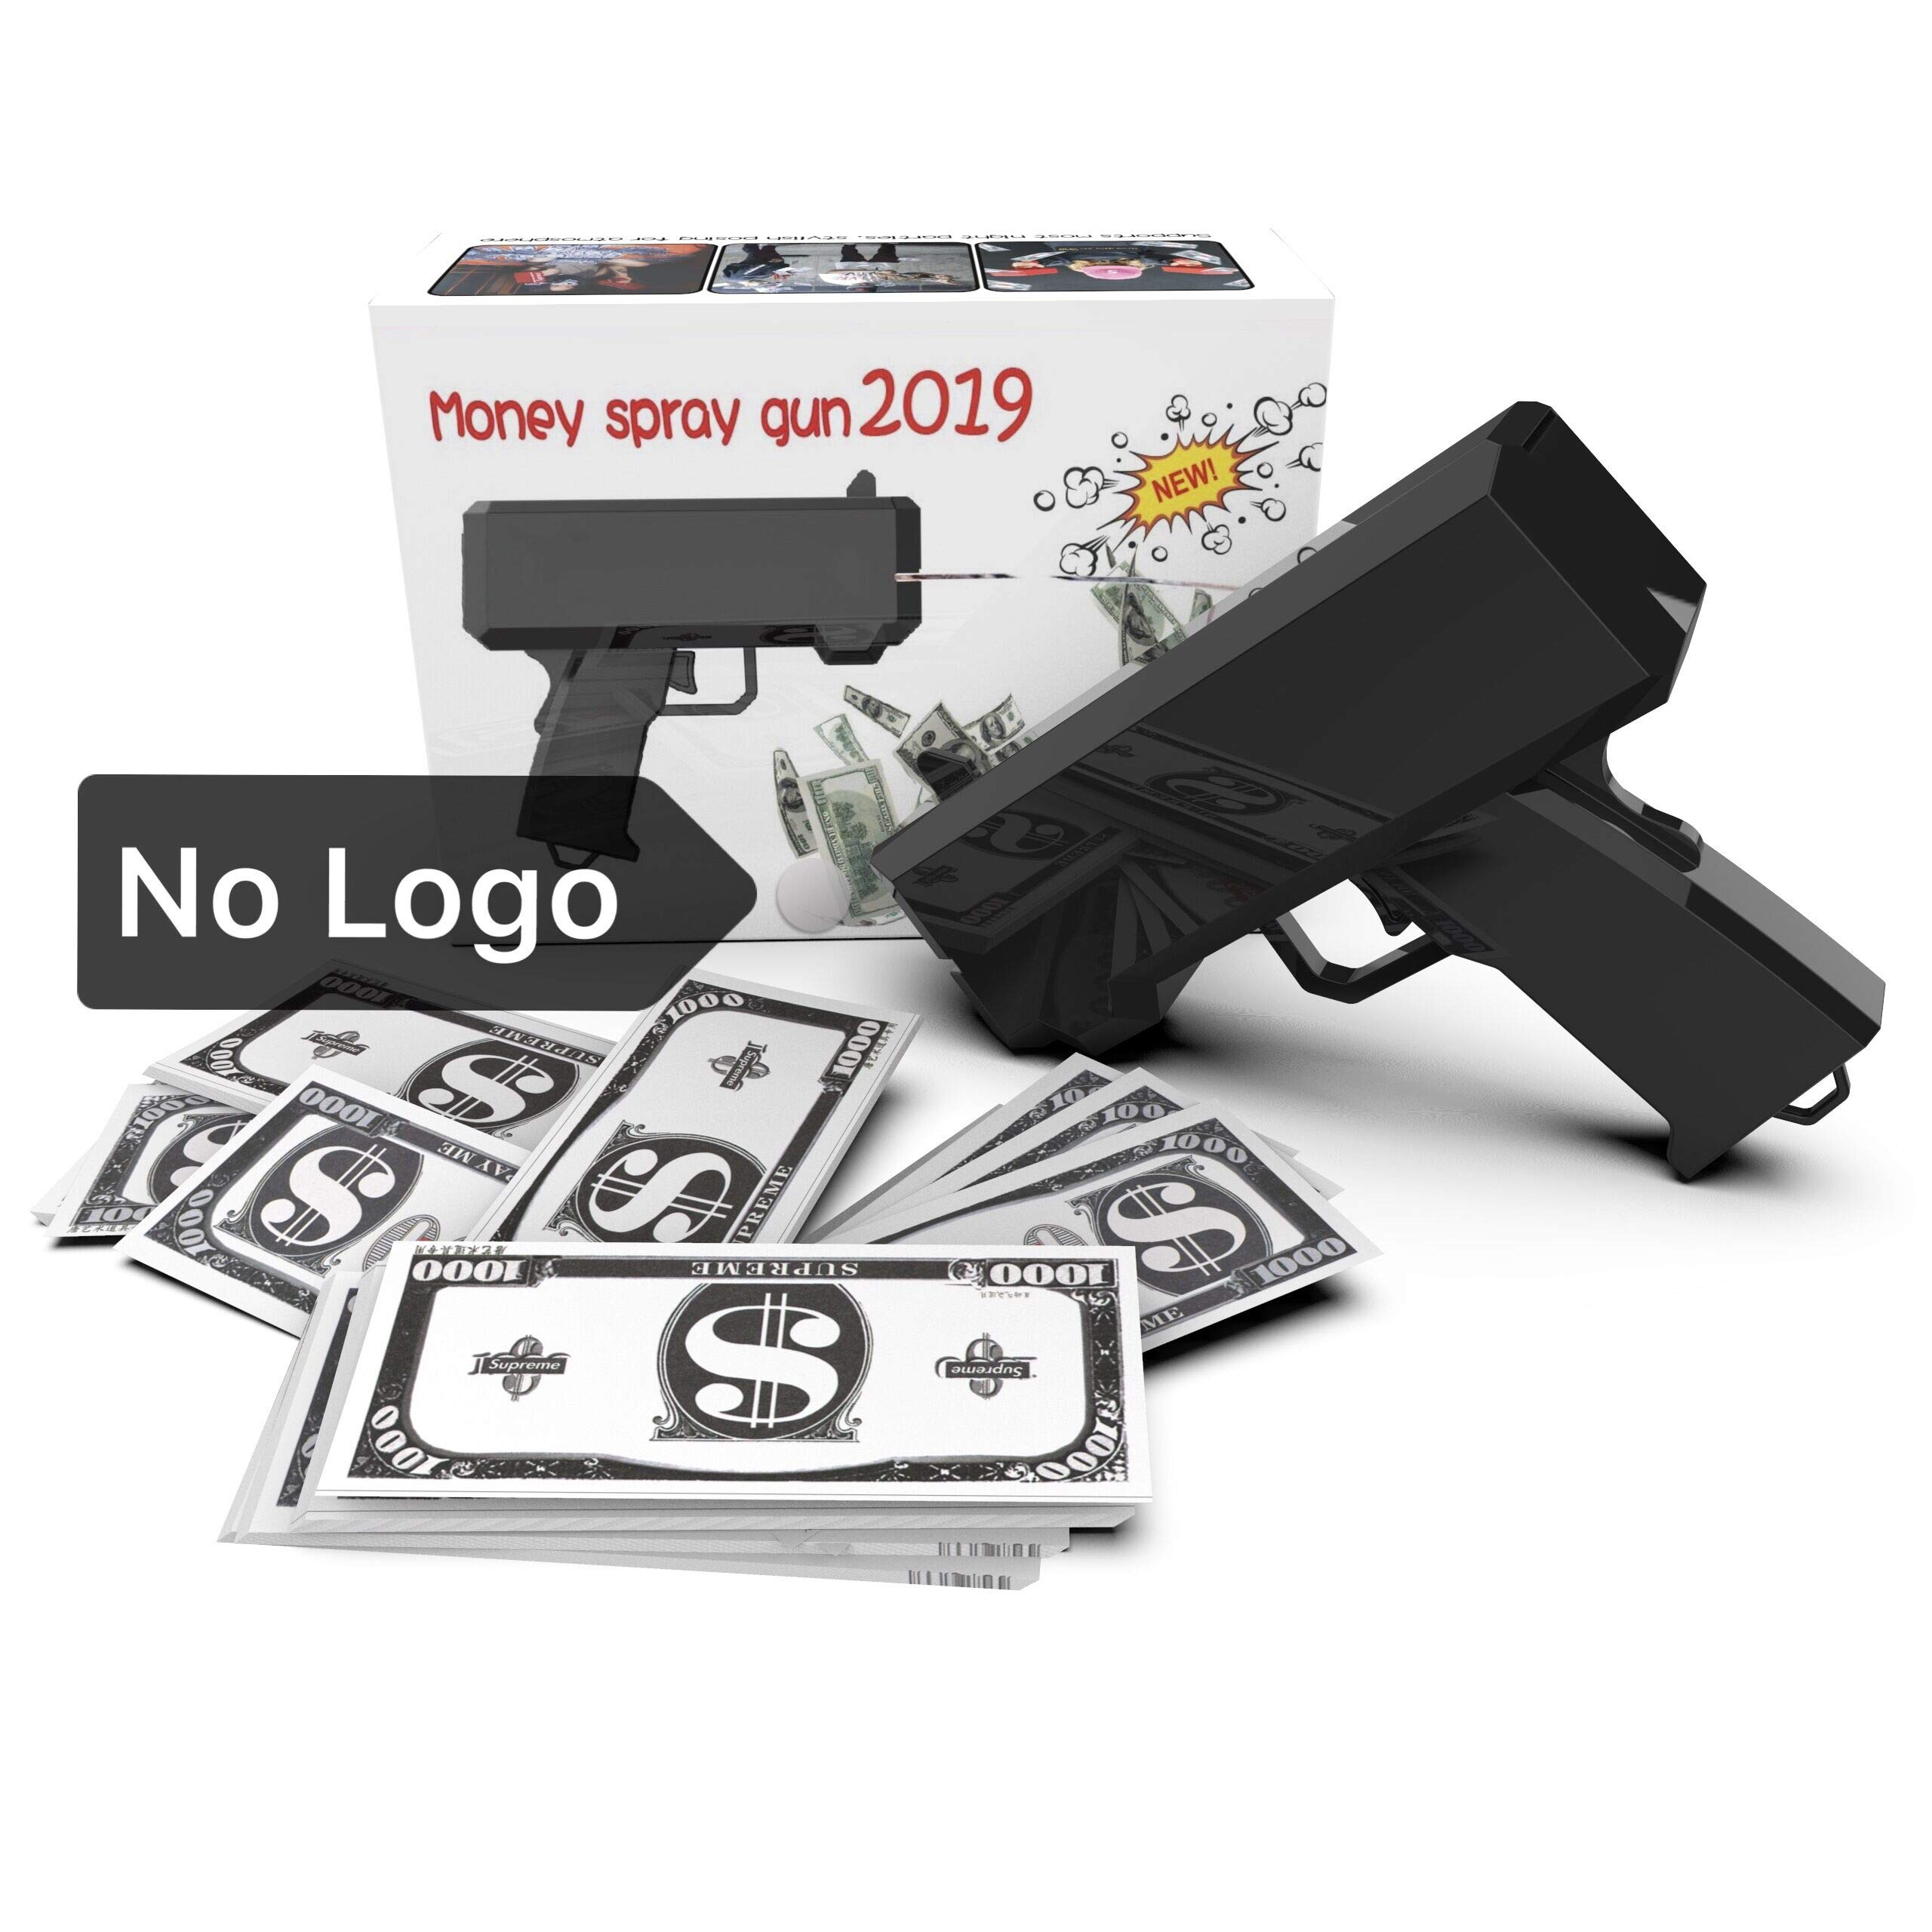 1731 NO Logo Money Gun with no Logo on Both Side it Come with10,000$ Fake Money, Money Gun with no Writing, Black Money Gun, Cash Gun for Game for Party Birthday by 1731